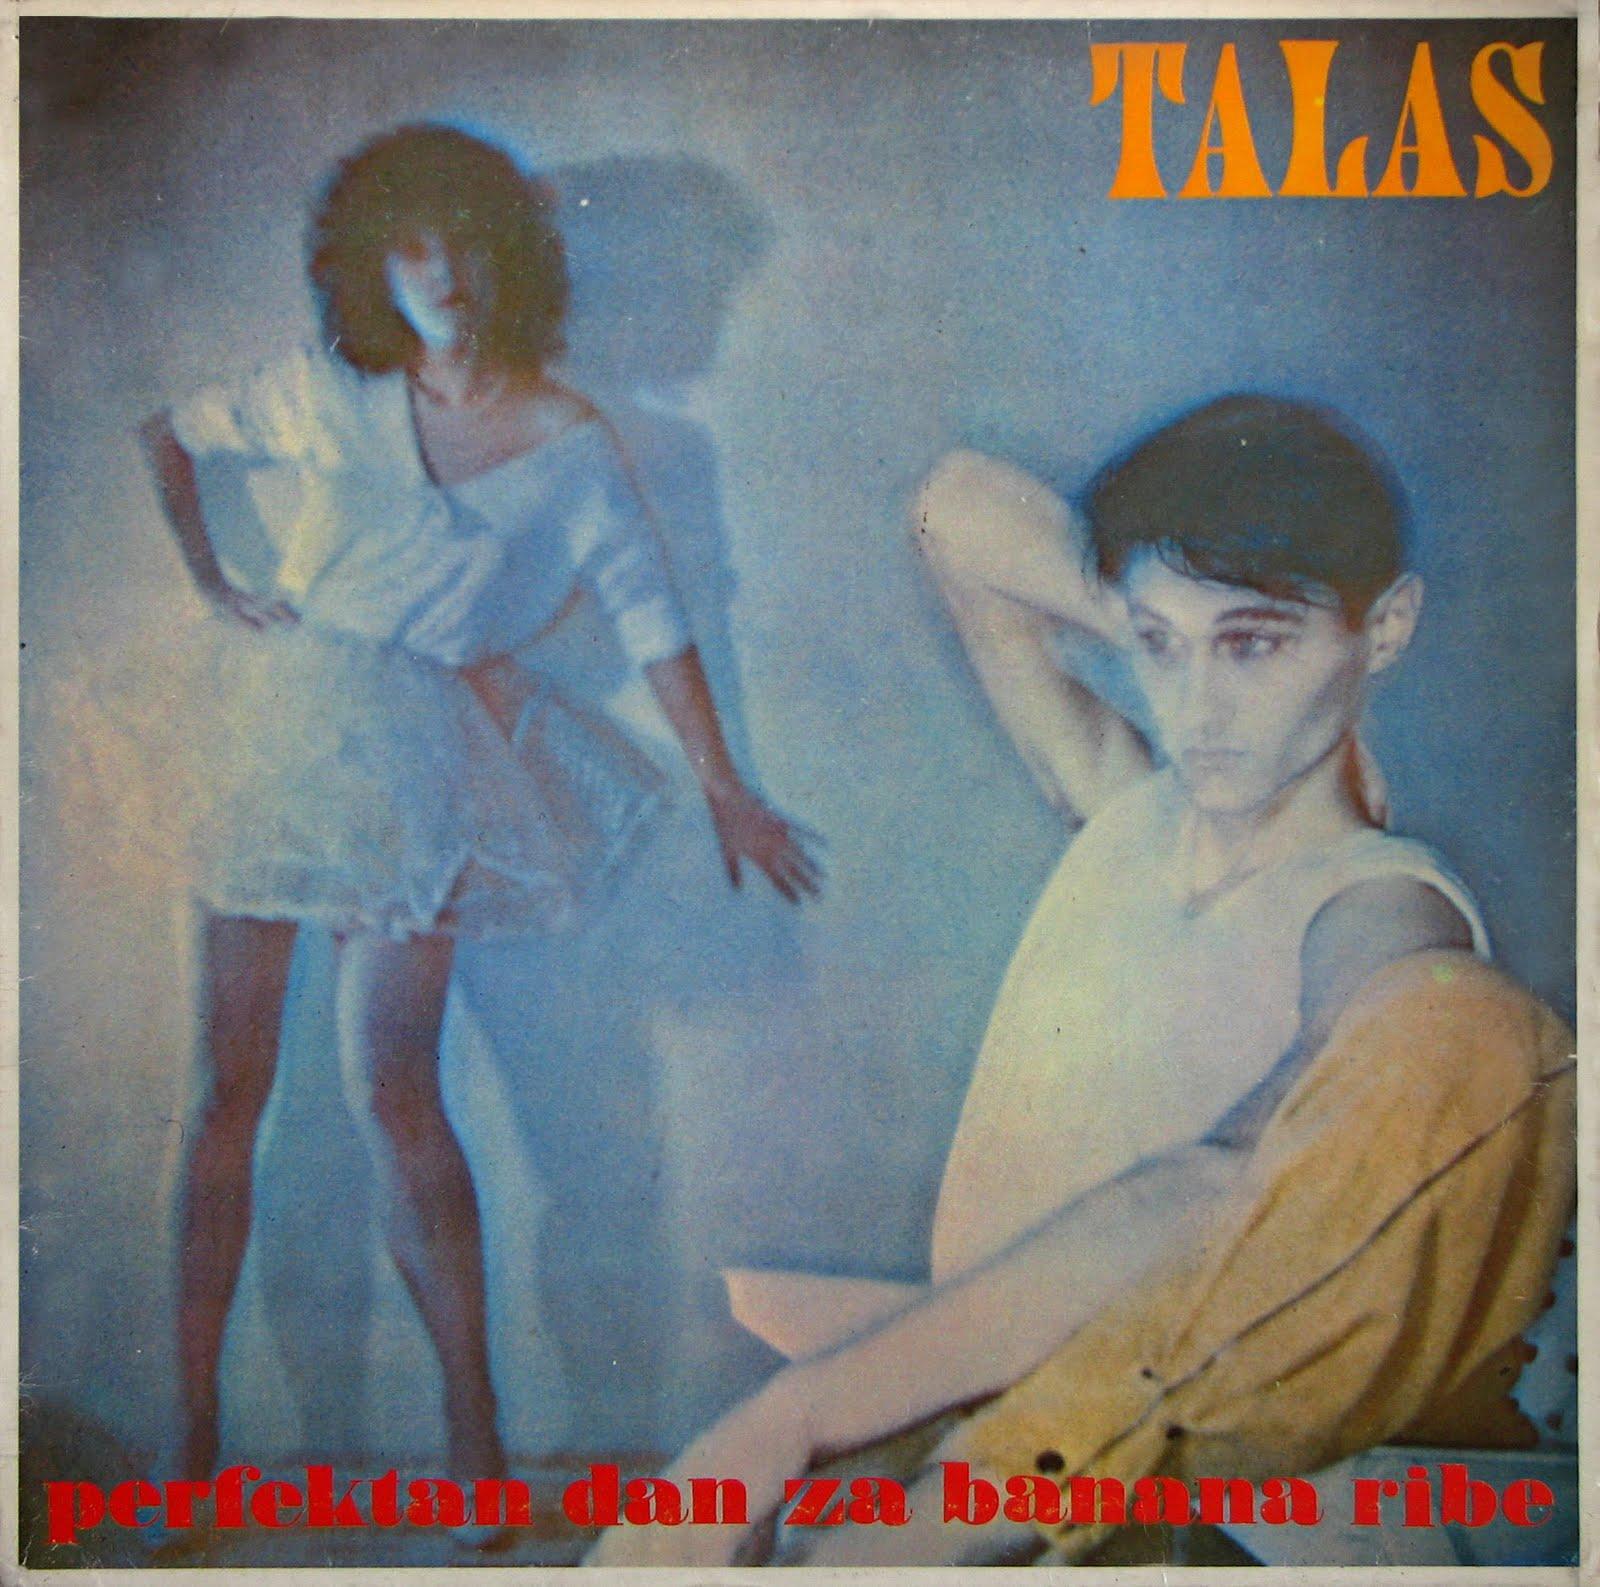 Talas - 1983 - Perfektan dan za banana ribe LP (1)